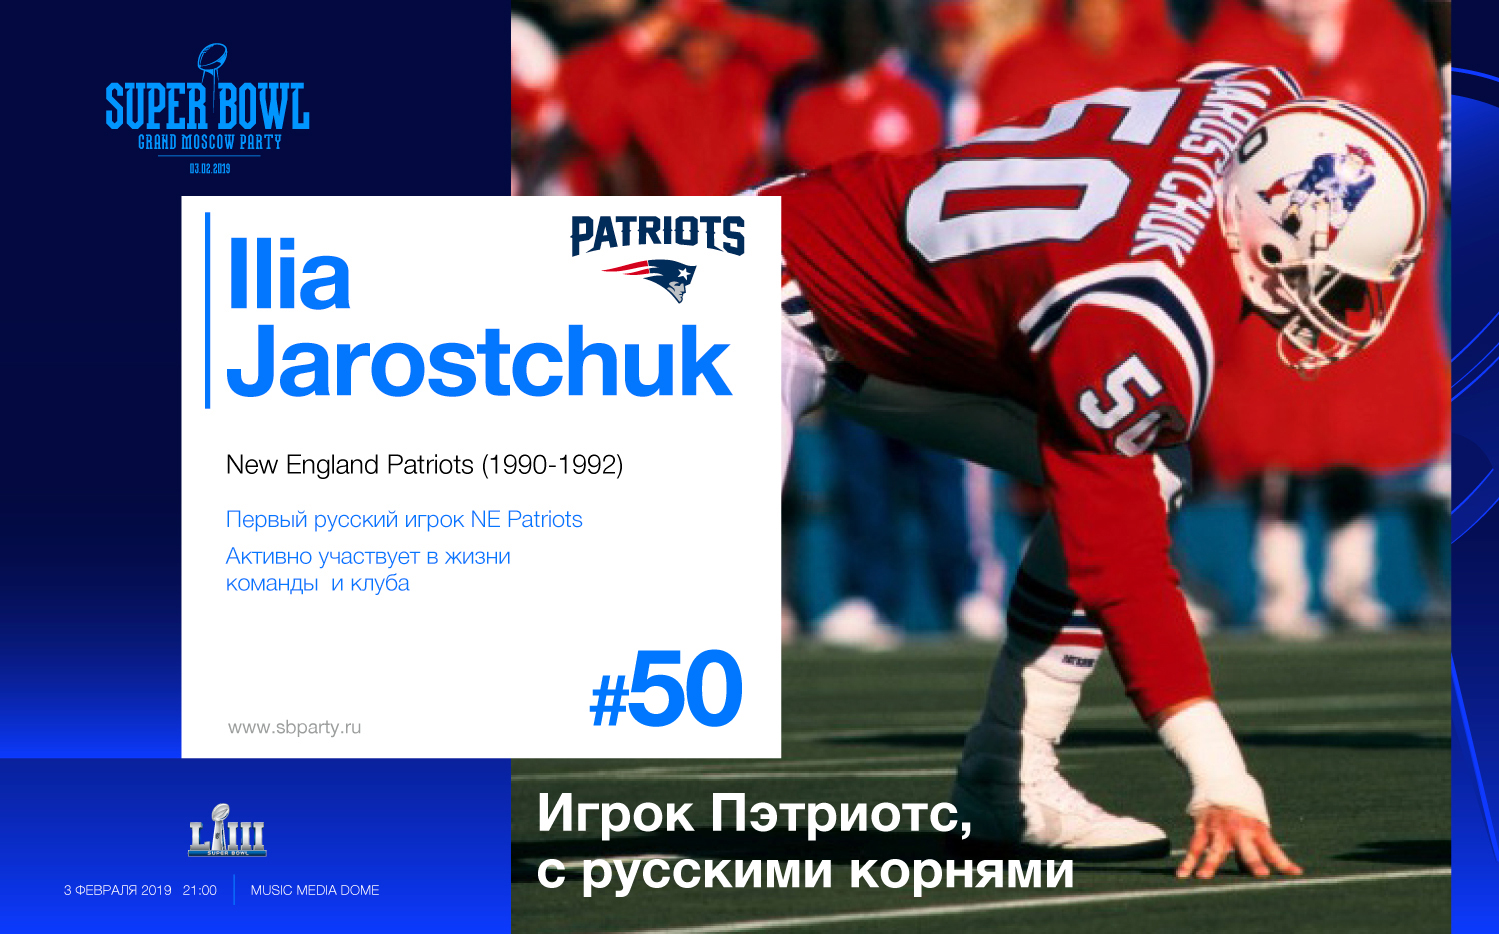 Ilia-Jarostchuk-01.jpg